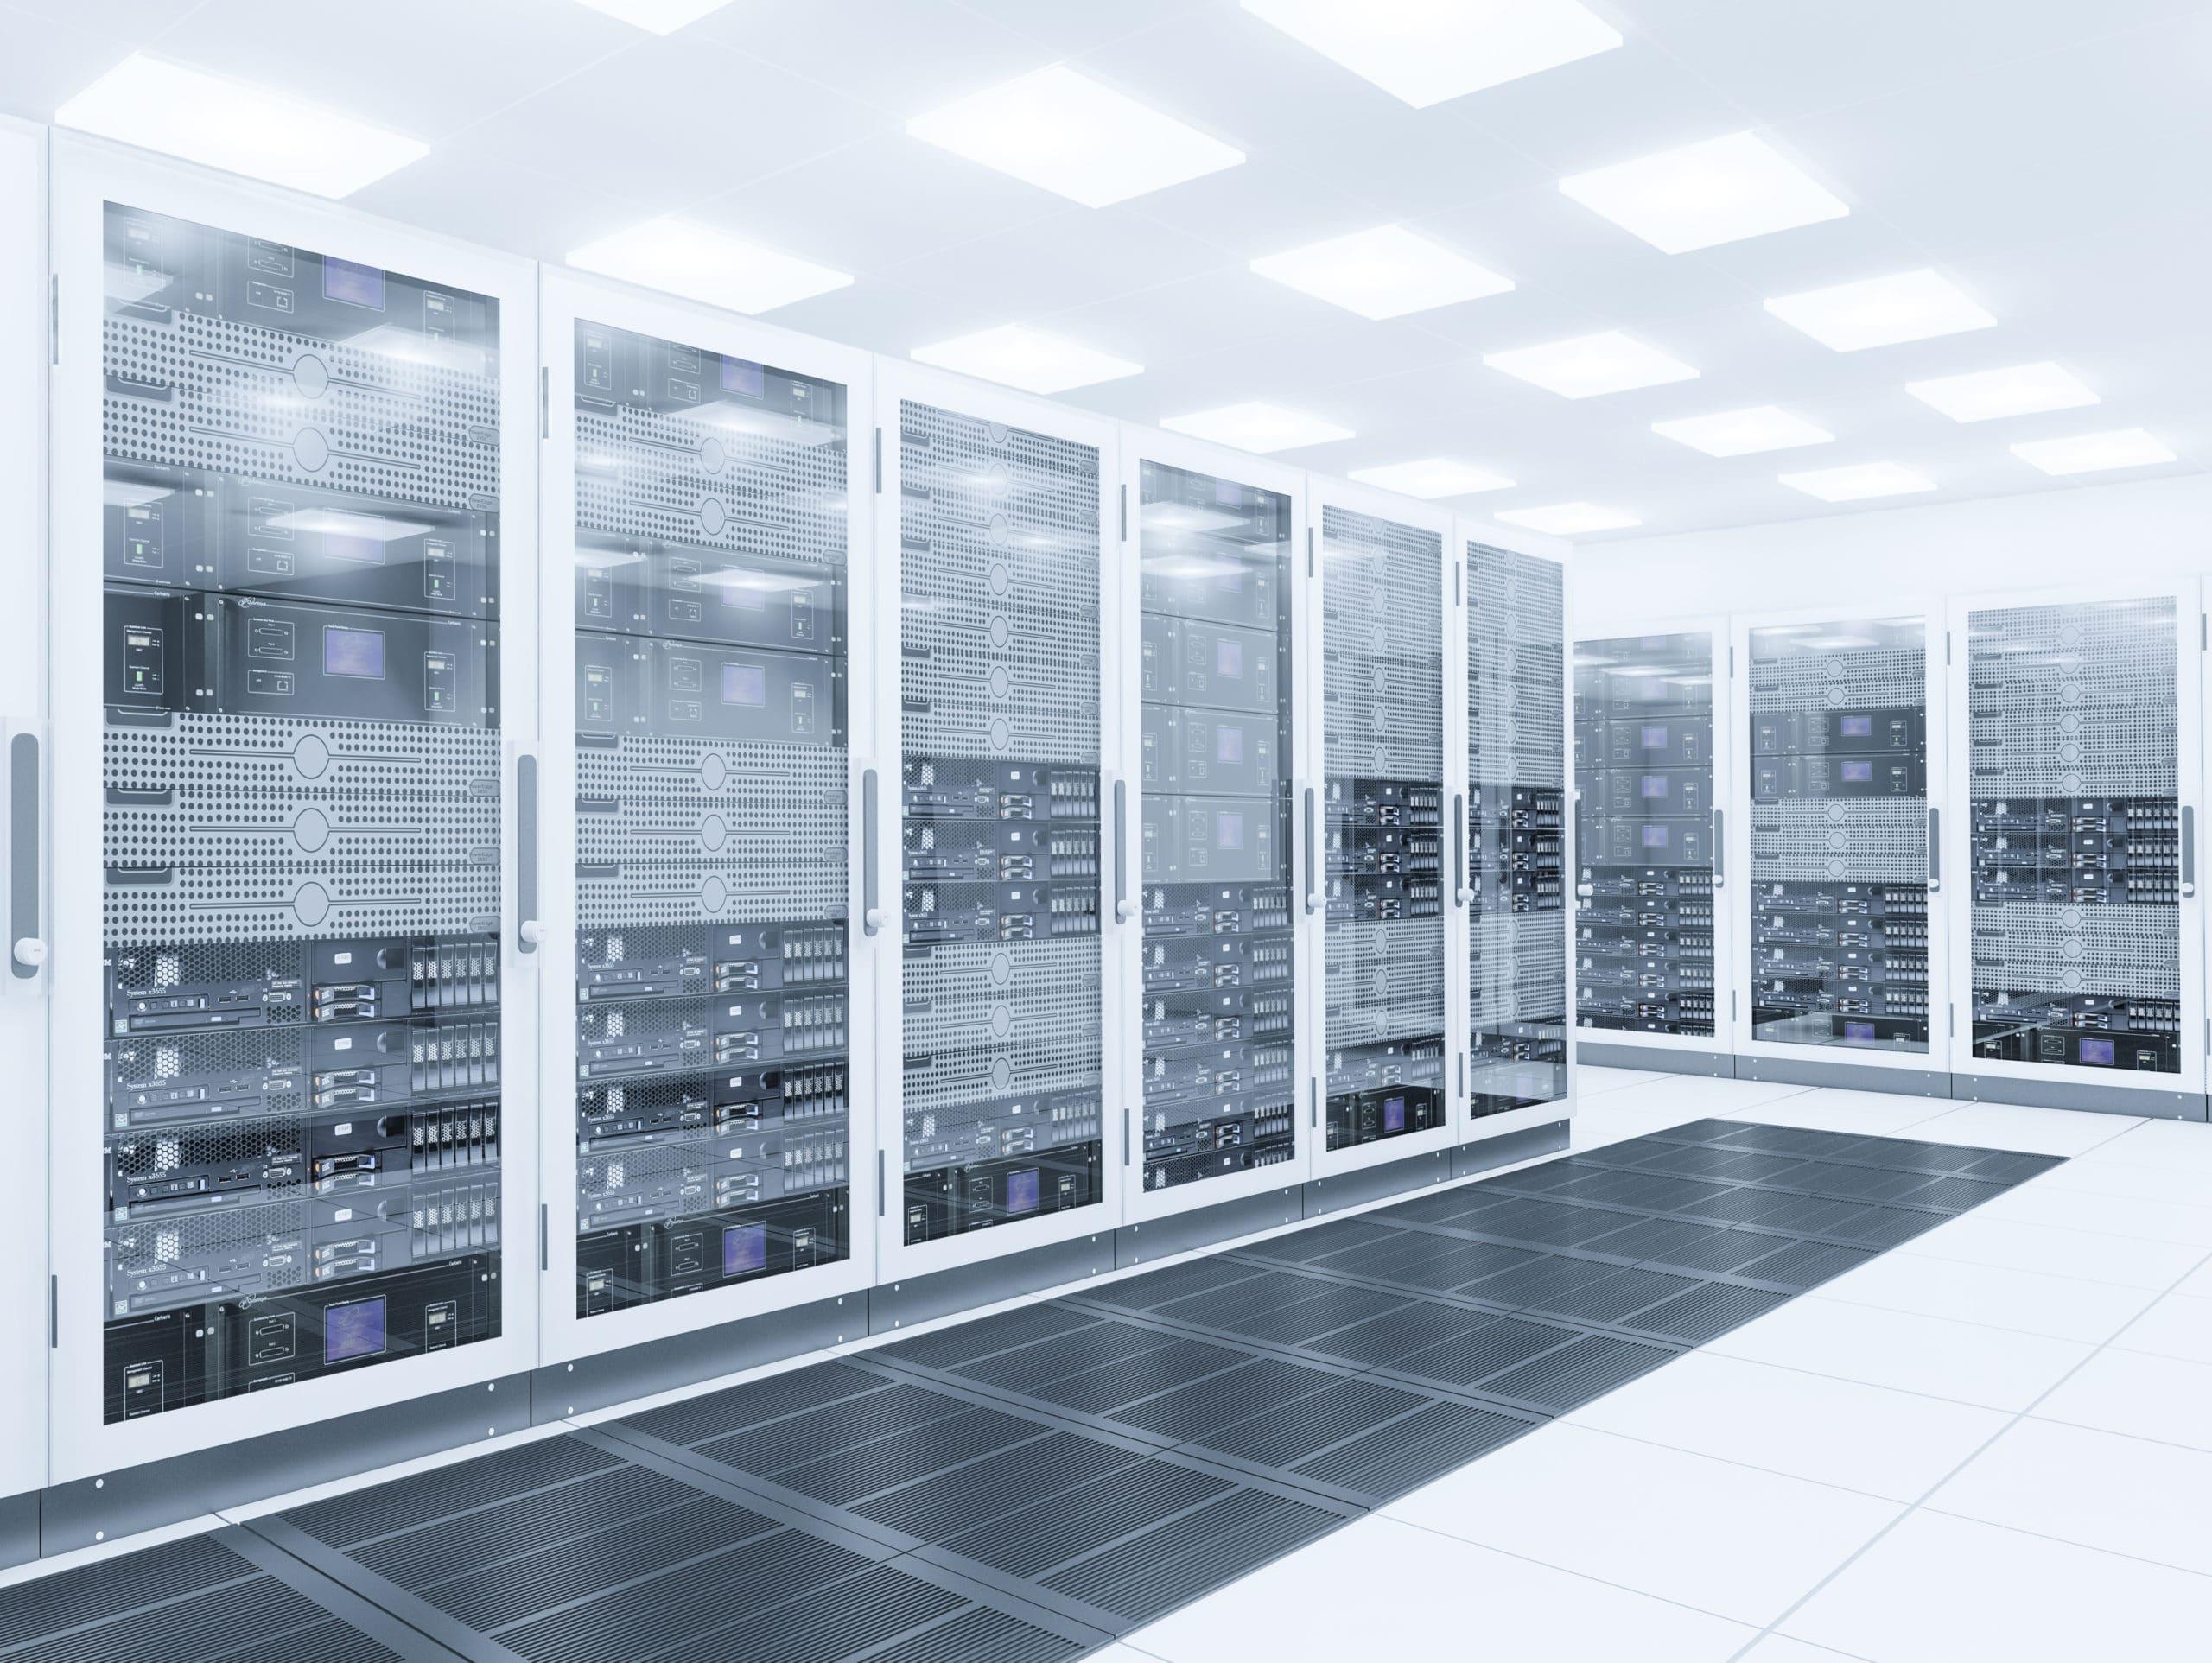 Cloud Serverraum